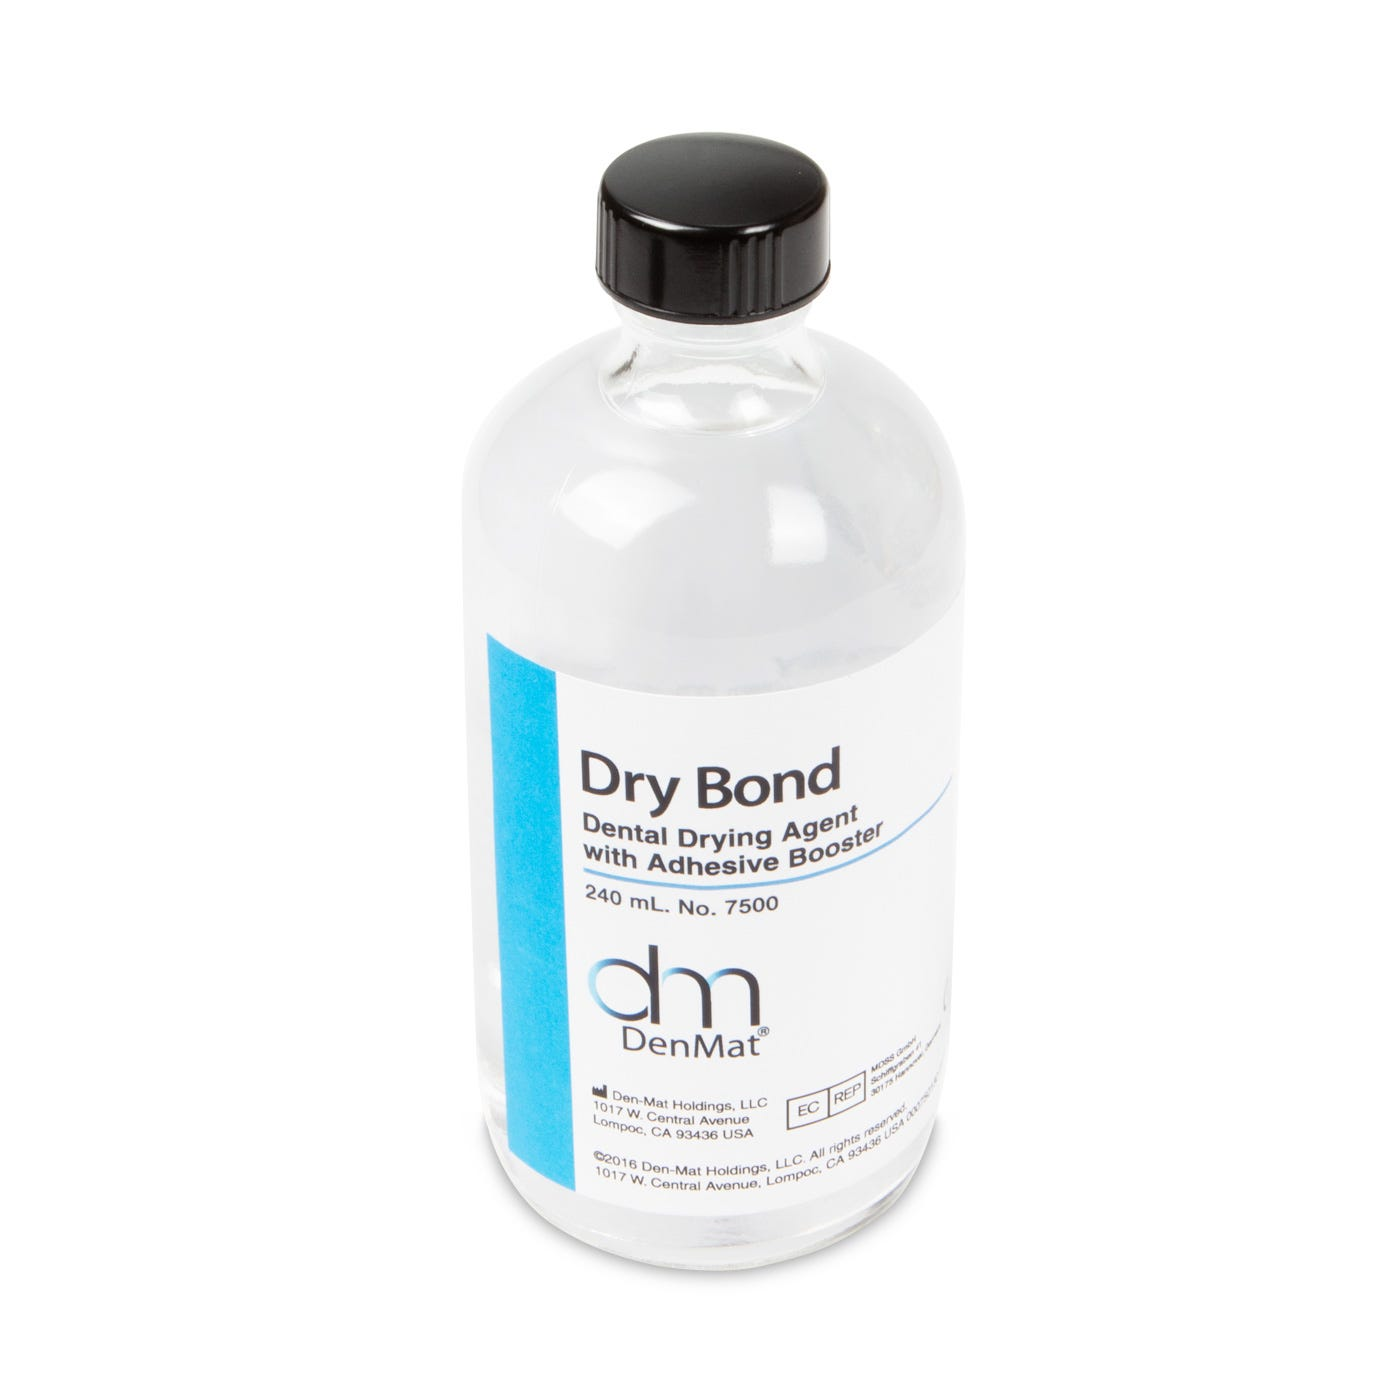 Dental Drying Agent - Dry Bond 240mL